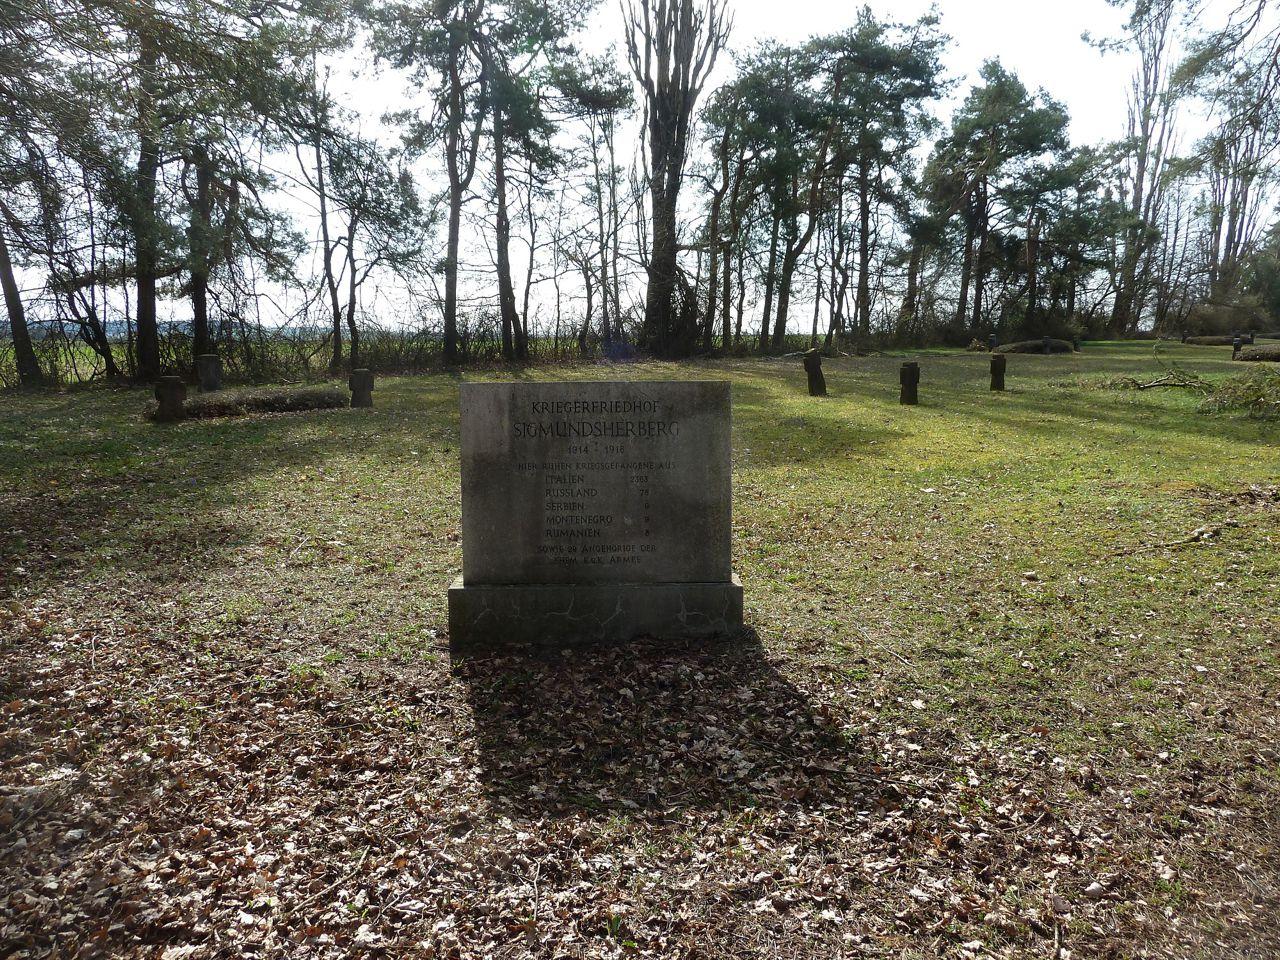 lapide posta nel cimitero